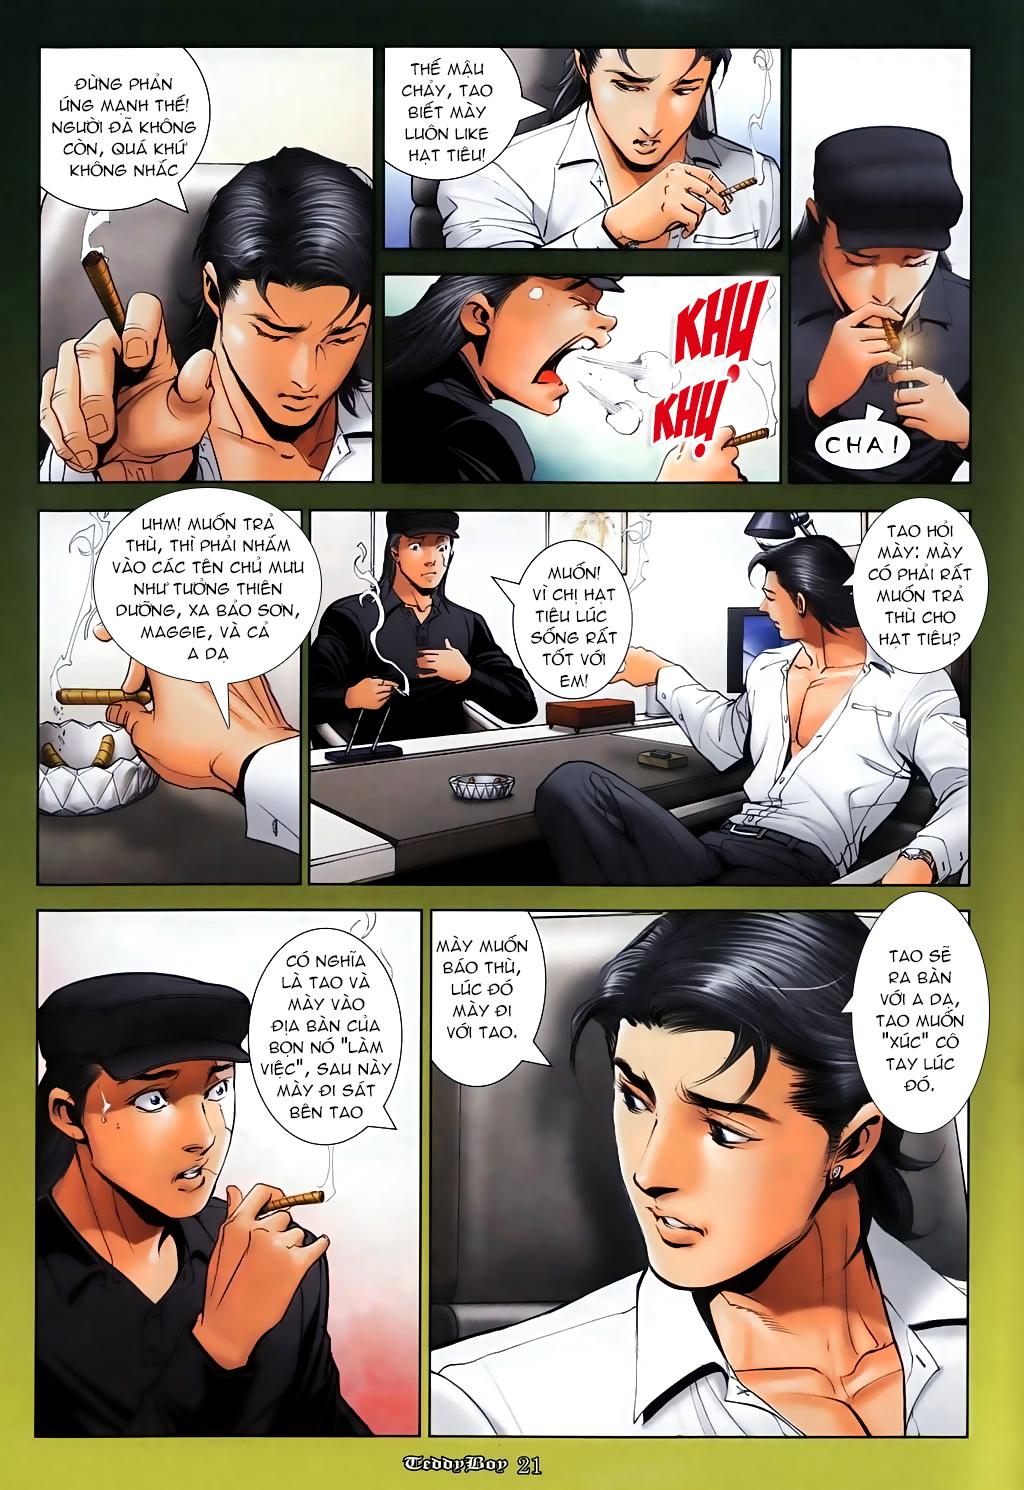 Người Trong Giang Hồ Chap 1022 - Truyen.Chap.VN